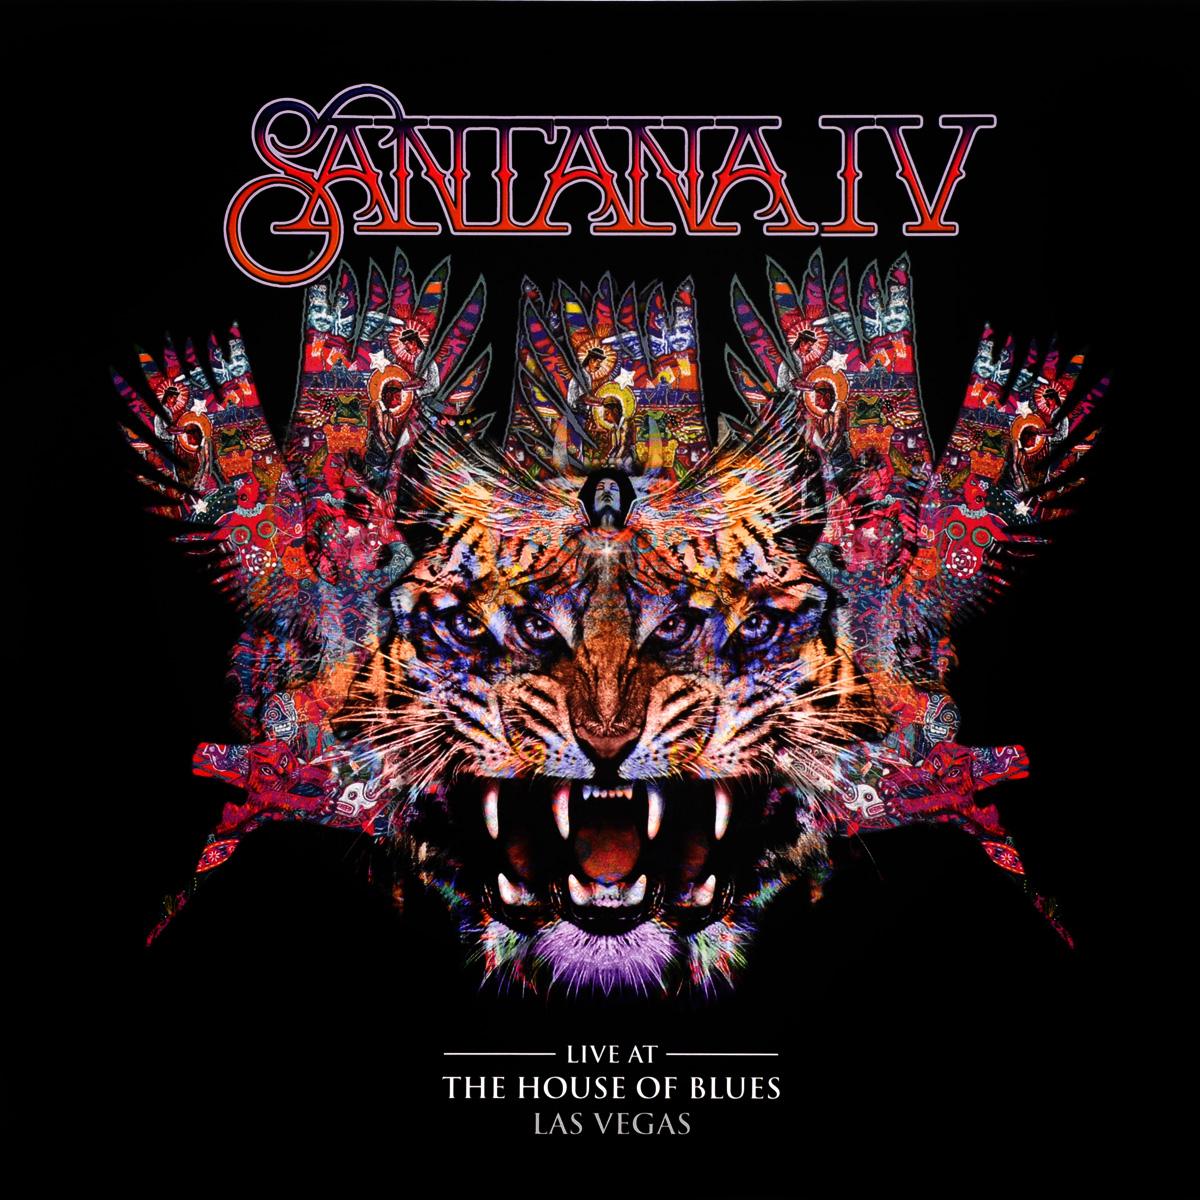 Карлос Сантана Carlos Santana. Santana IV. Live At The House Of Blues, Las Vegas (3 LP + DVD) santana santana corazon live from mexico live it to believe it cd dvd